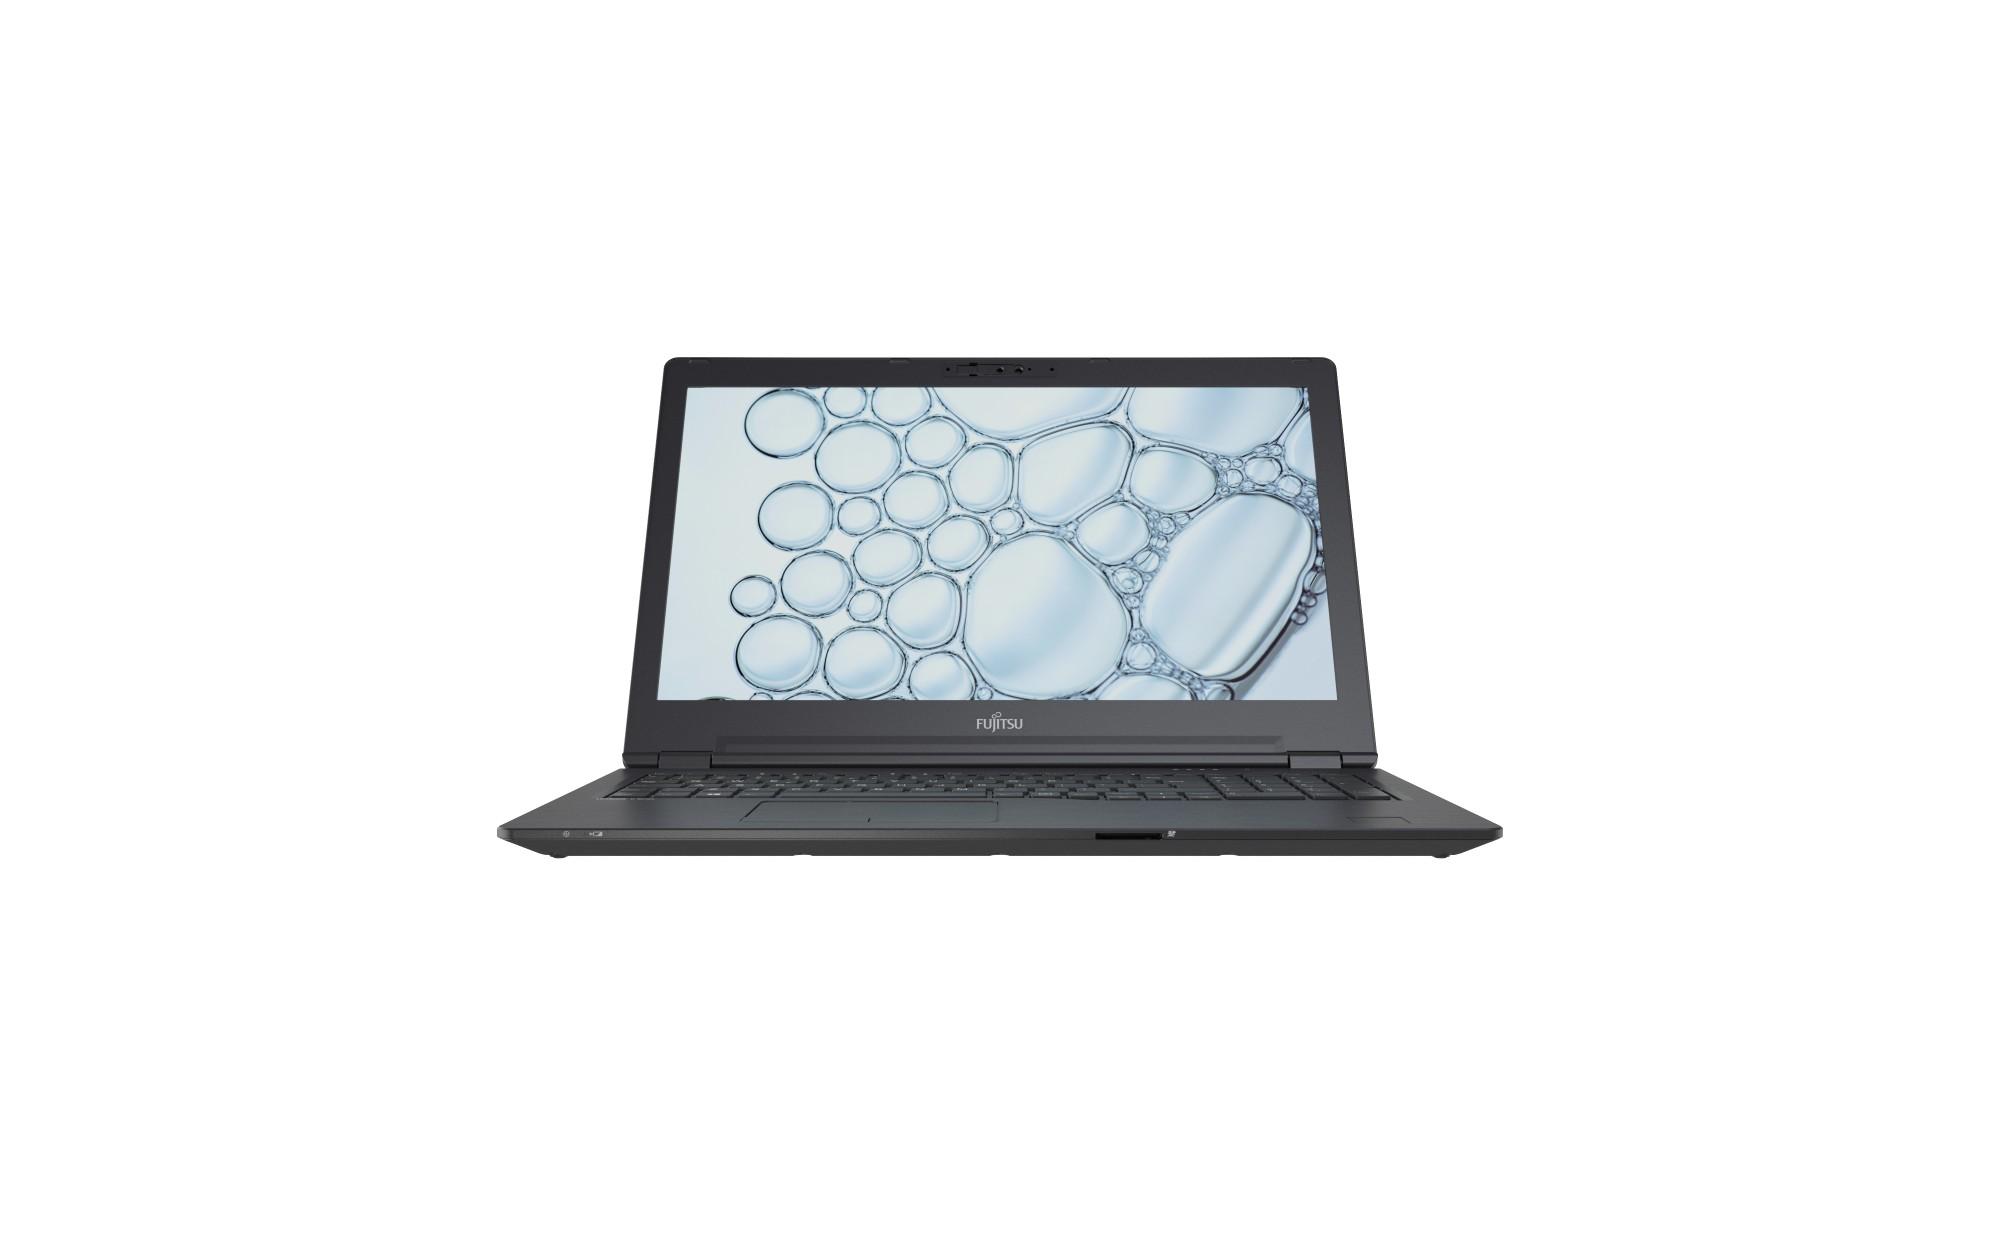 "Fujitsu LIFEBOOK U7510 Portátil Negro 39,6 cm (15.6"") 1920 x 1080 Pixeles Intel® Core™ i7 de 10ma Generación 8 GB DDR4-SDRAM 256 GB SSD Wi-Fi 6 (802.11ax) Windows 10 Pro"